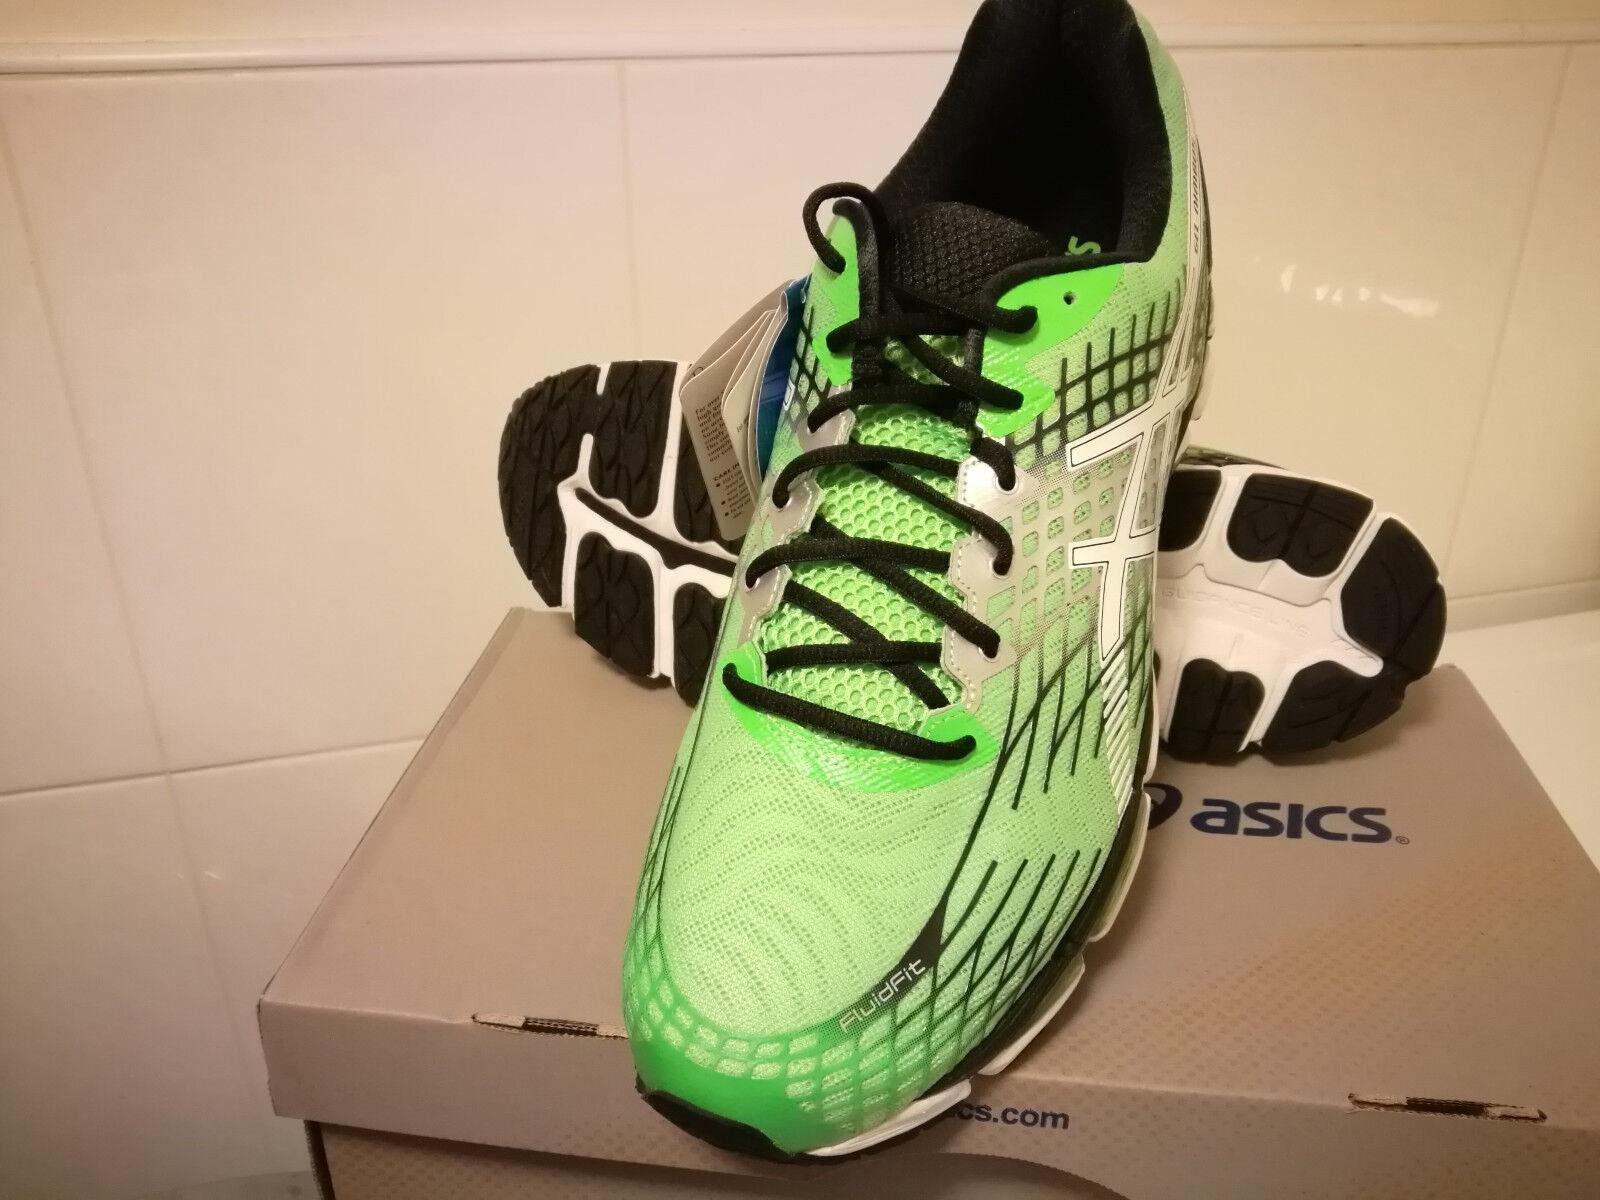 Di nuovo!mens asic gel nimbus 17 scarpe ginnastica da corsa scarpe da ginnastica scarpe - 15 verde 8e9547